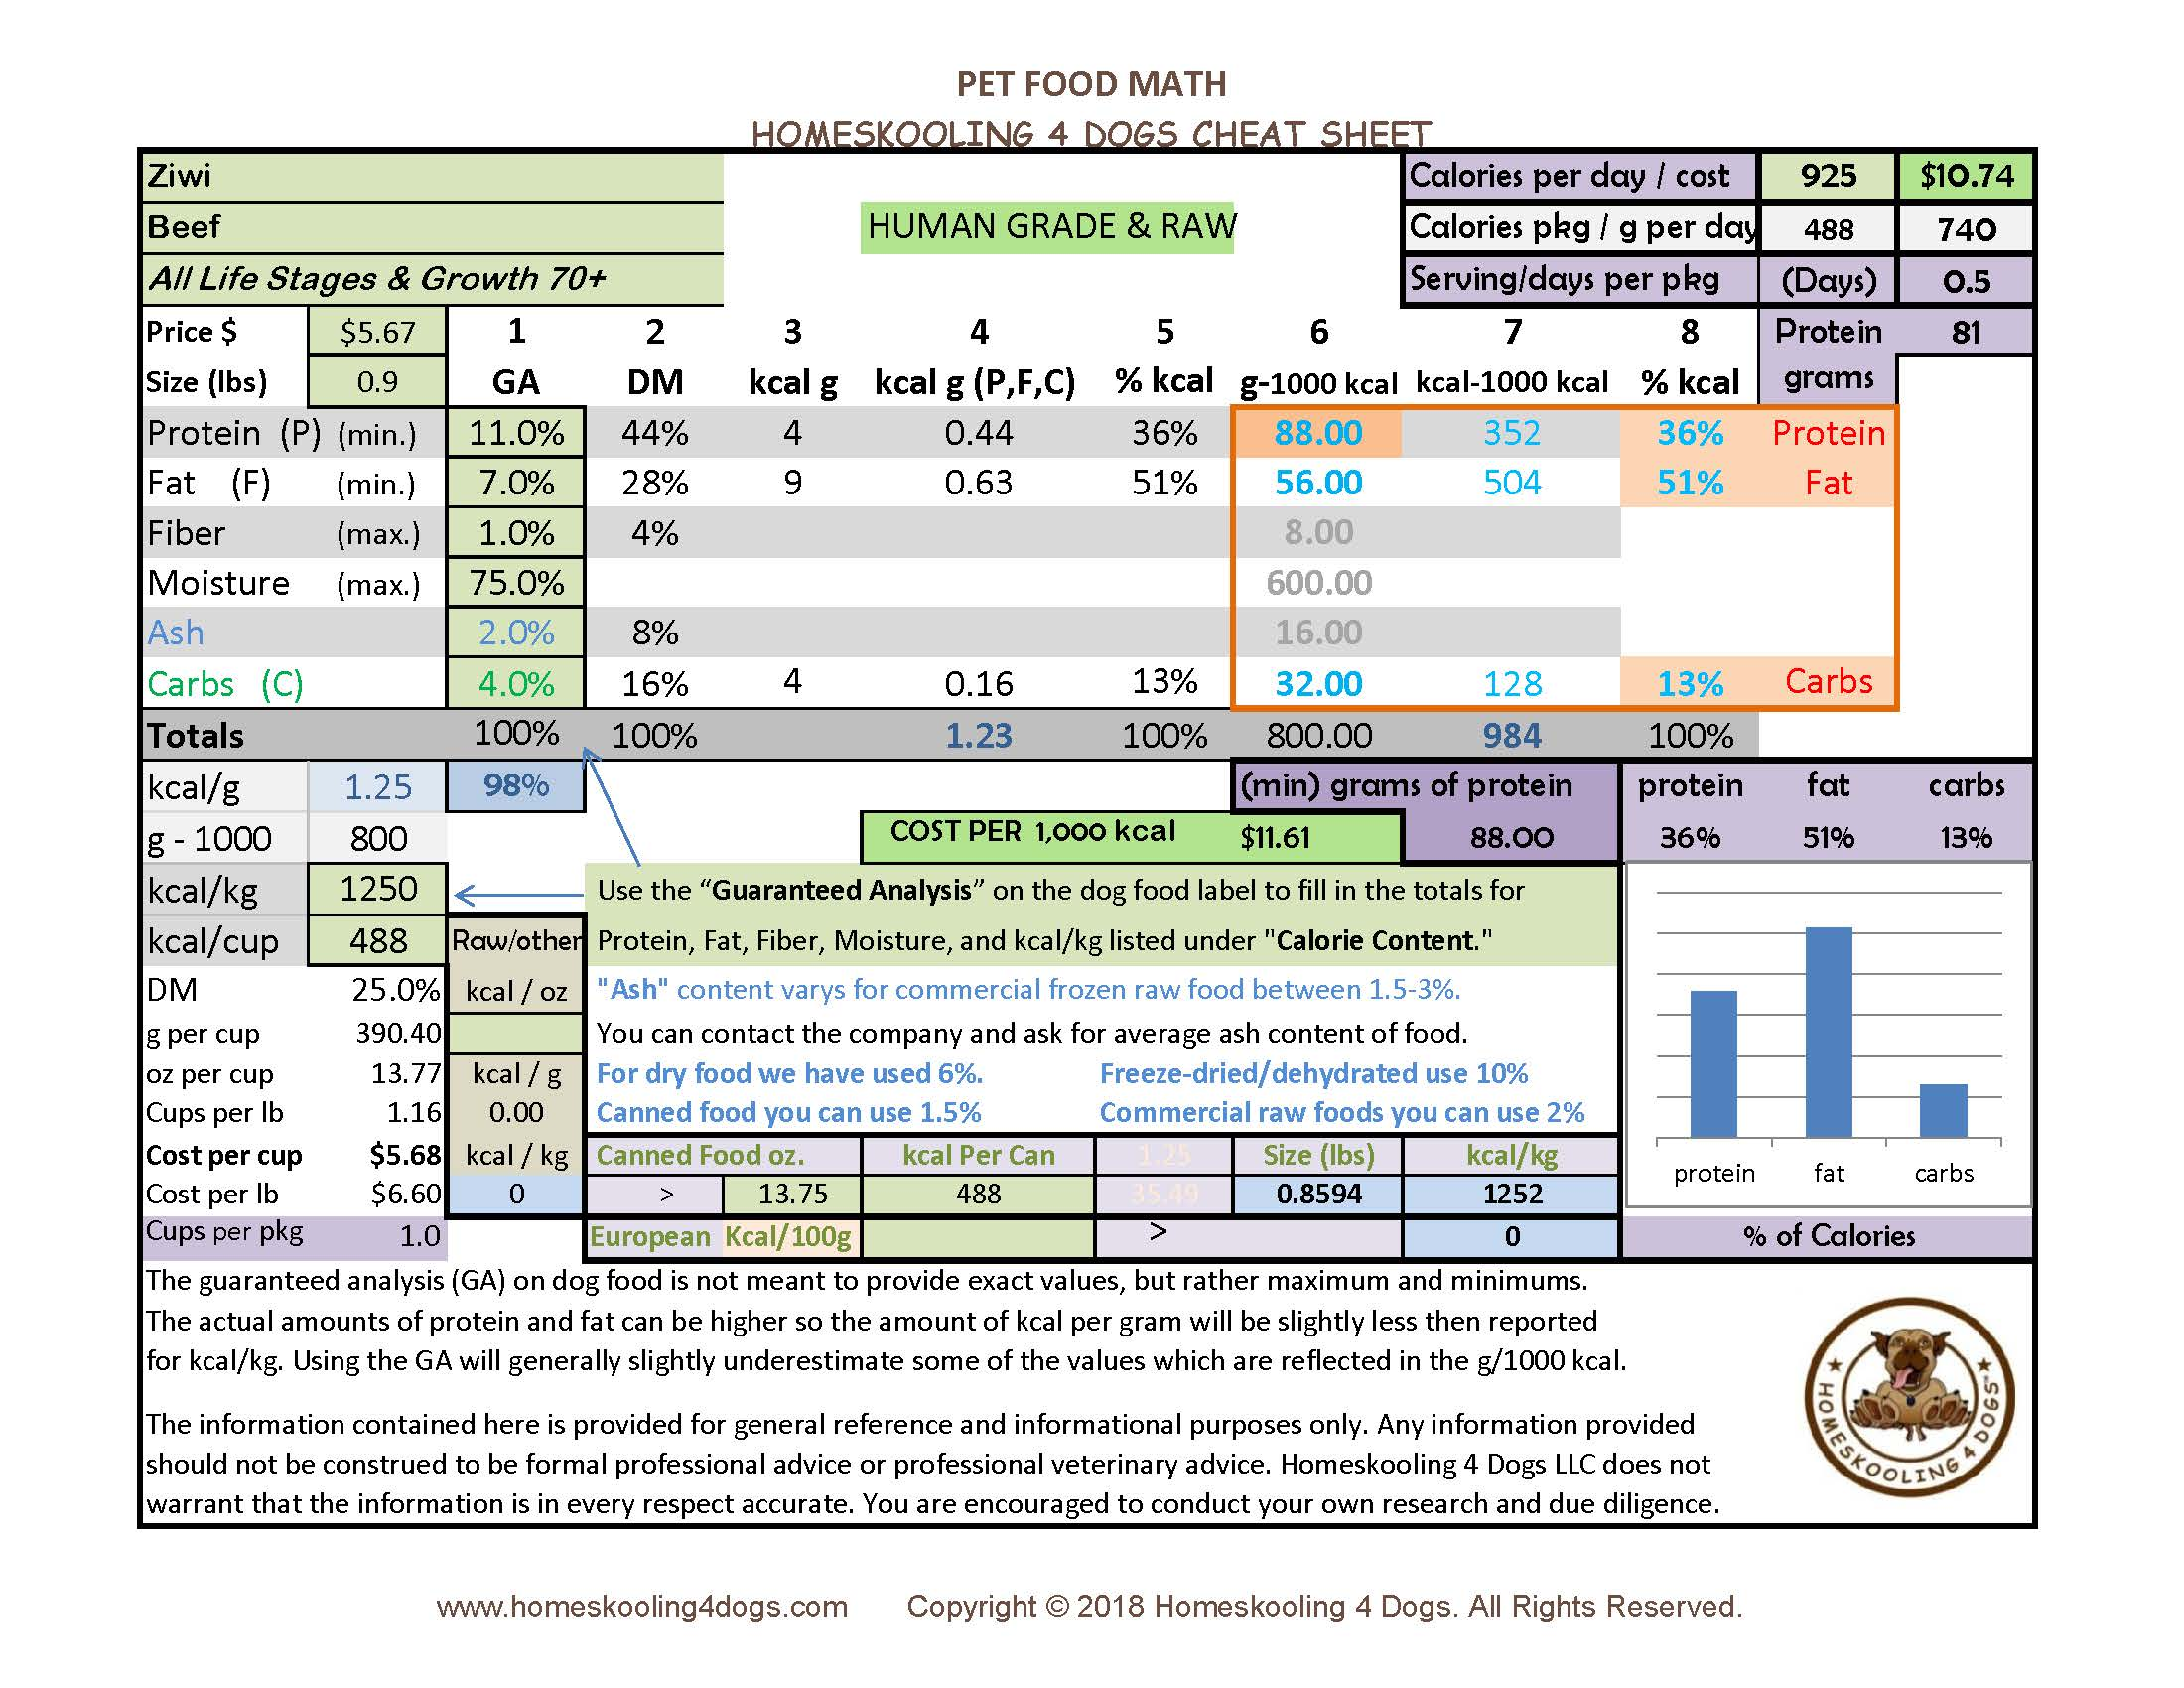 Ziwi beef TA.jpg update.jpg